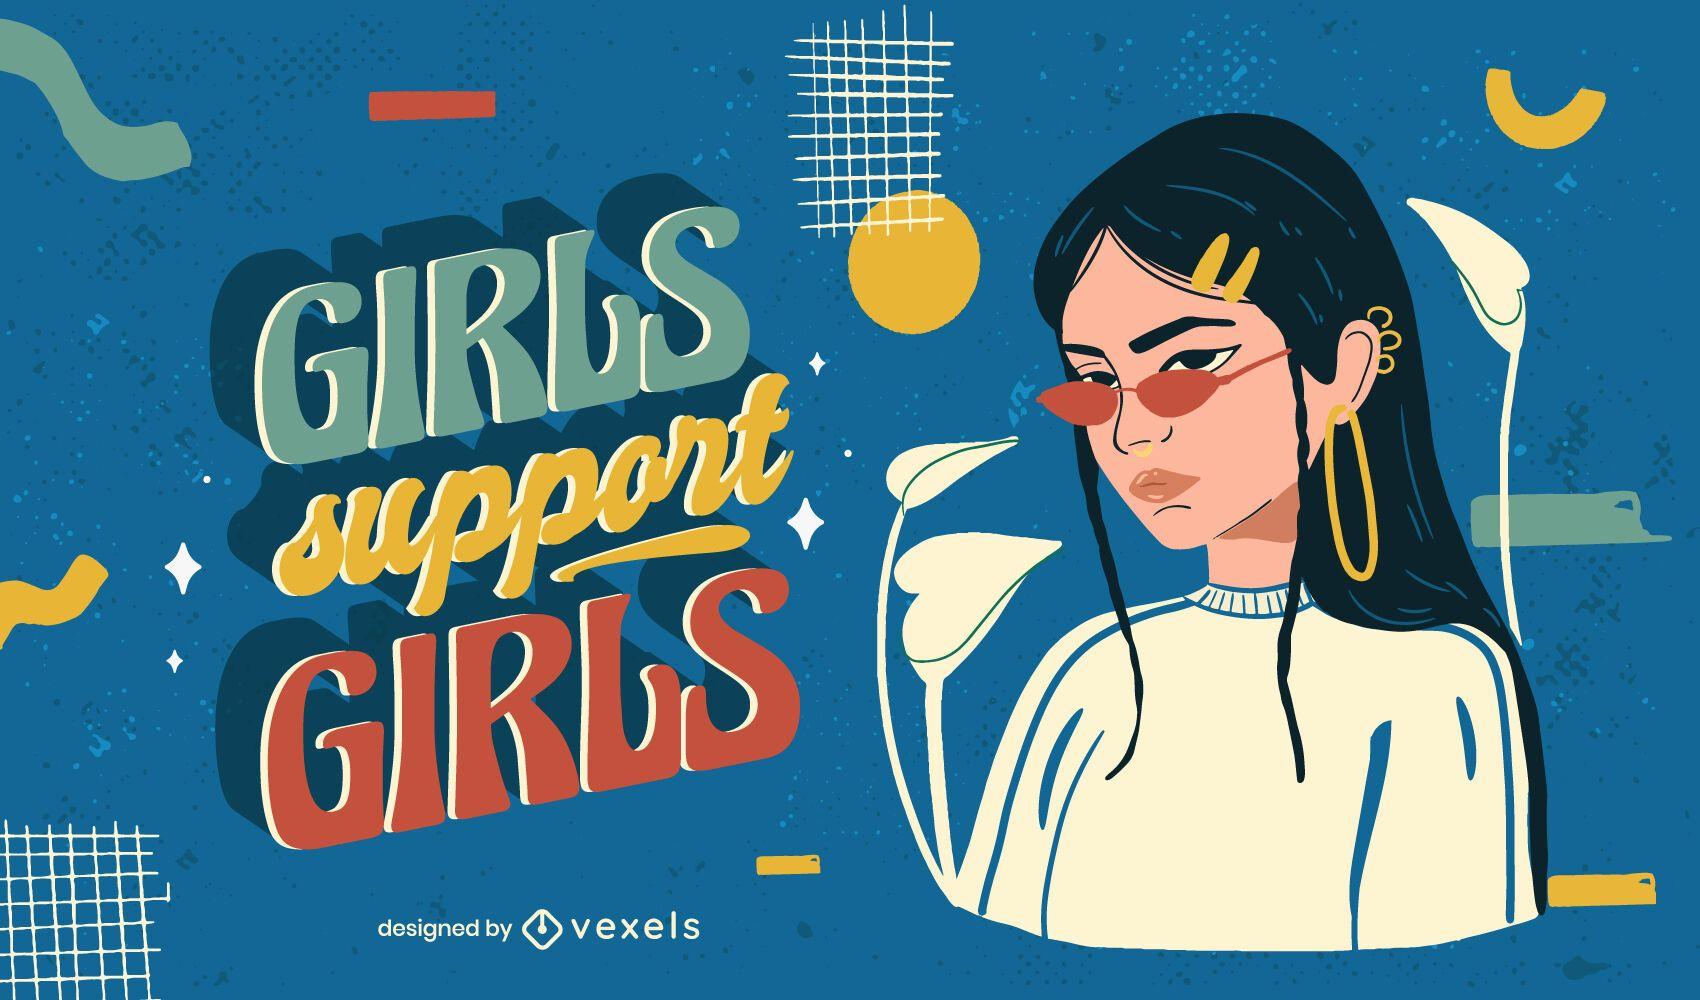 Girls support girls illustration